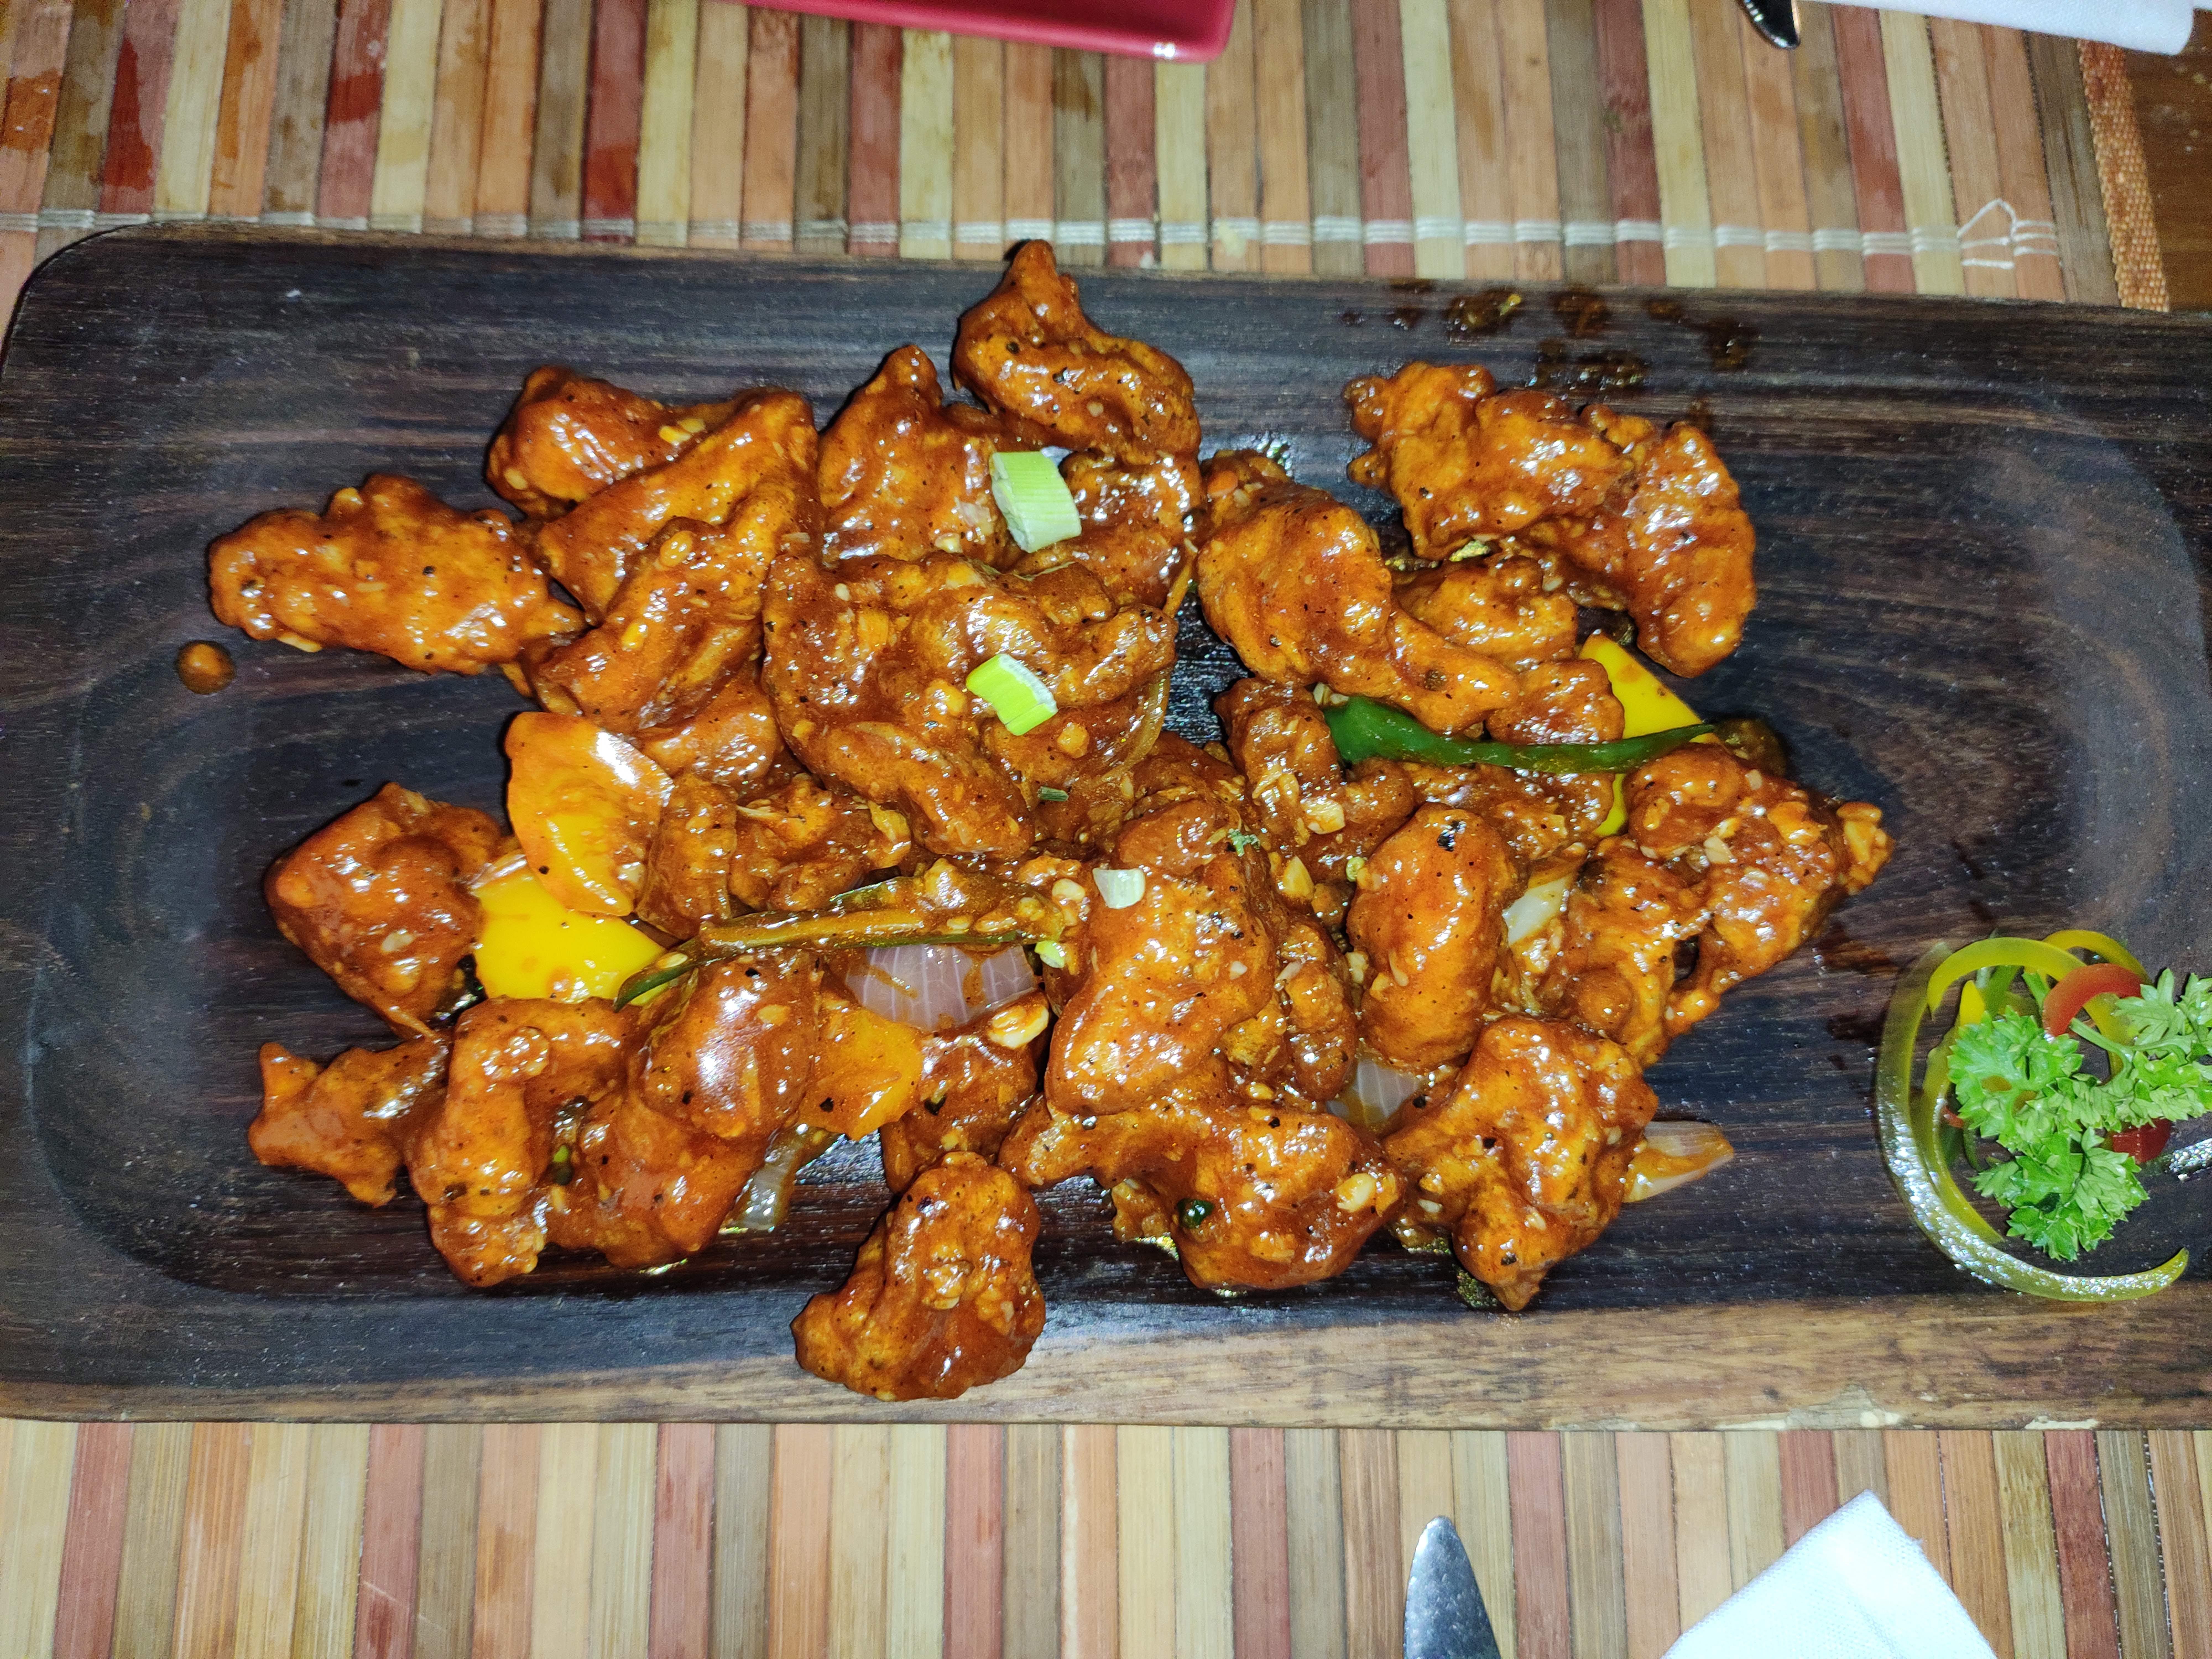 Dish,Food,Cuisine,Ingredient,Meat,Fried food,Orange chicken,Produce,Recipe,Fried chicken